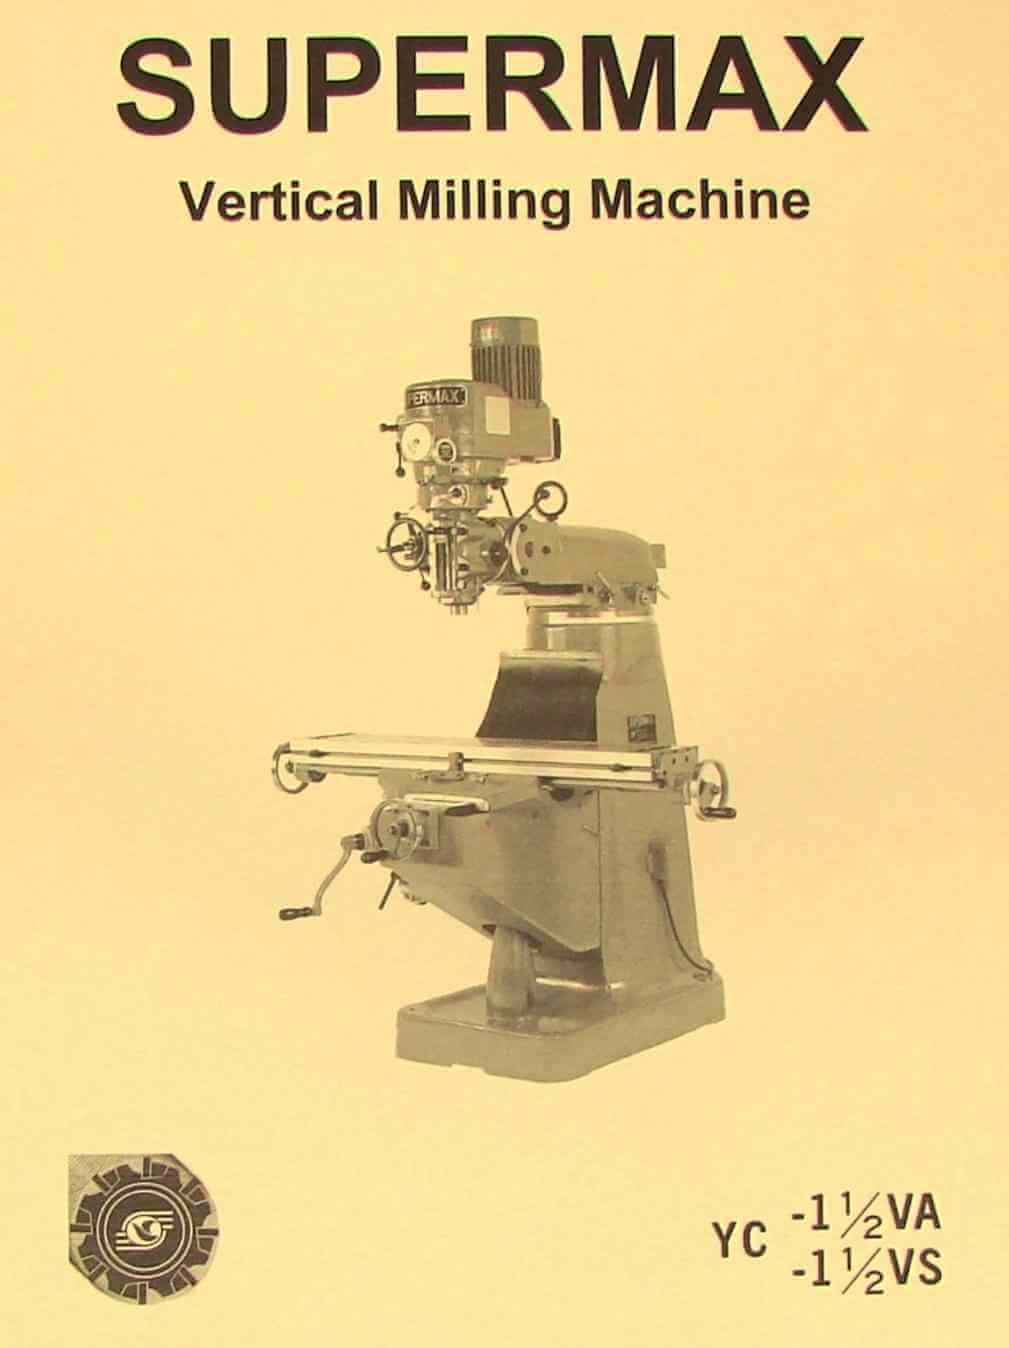 hight resolution of supermax yc 1 1 2 va vs vertical milling machine operating parts manual yc 1 1 2 va vs ozark tool manuals books